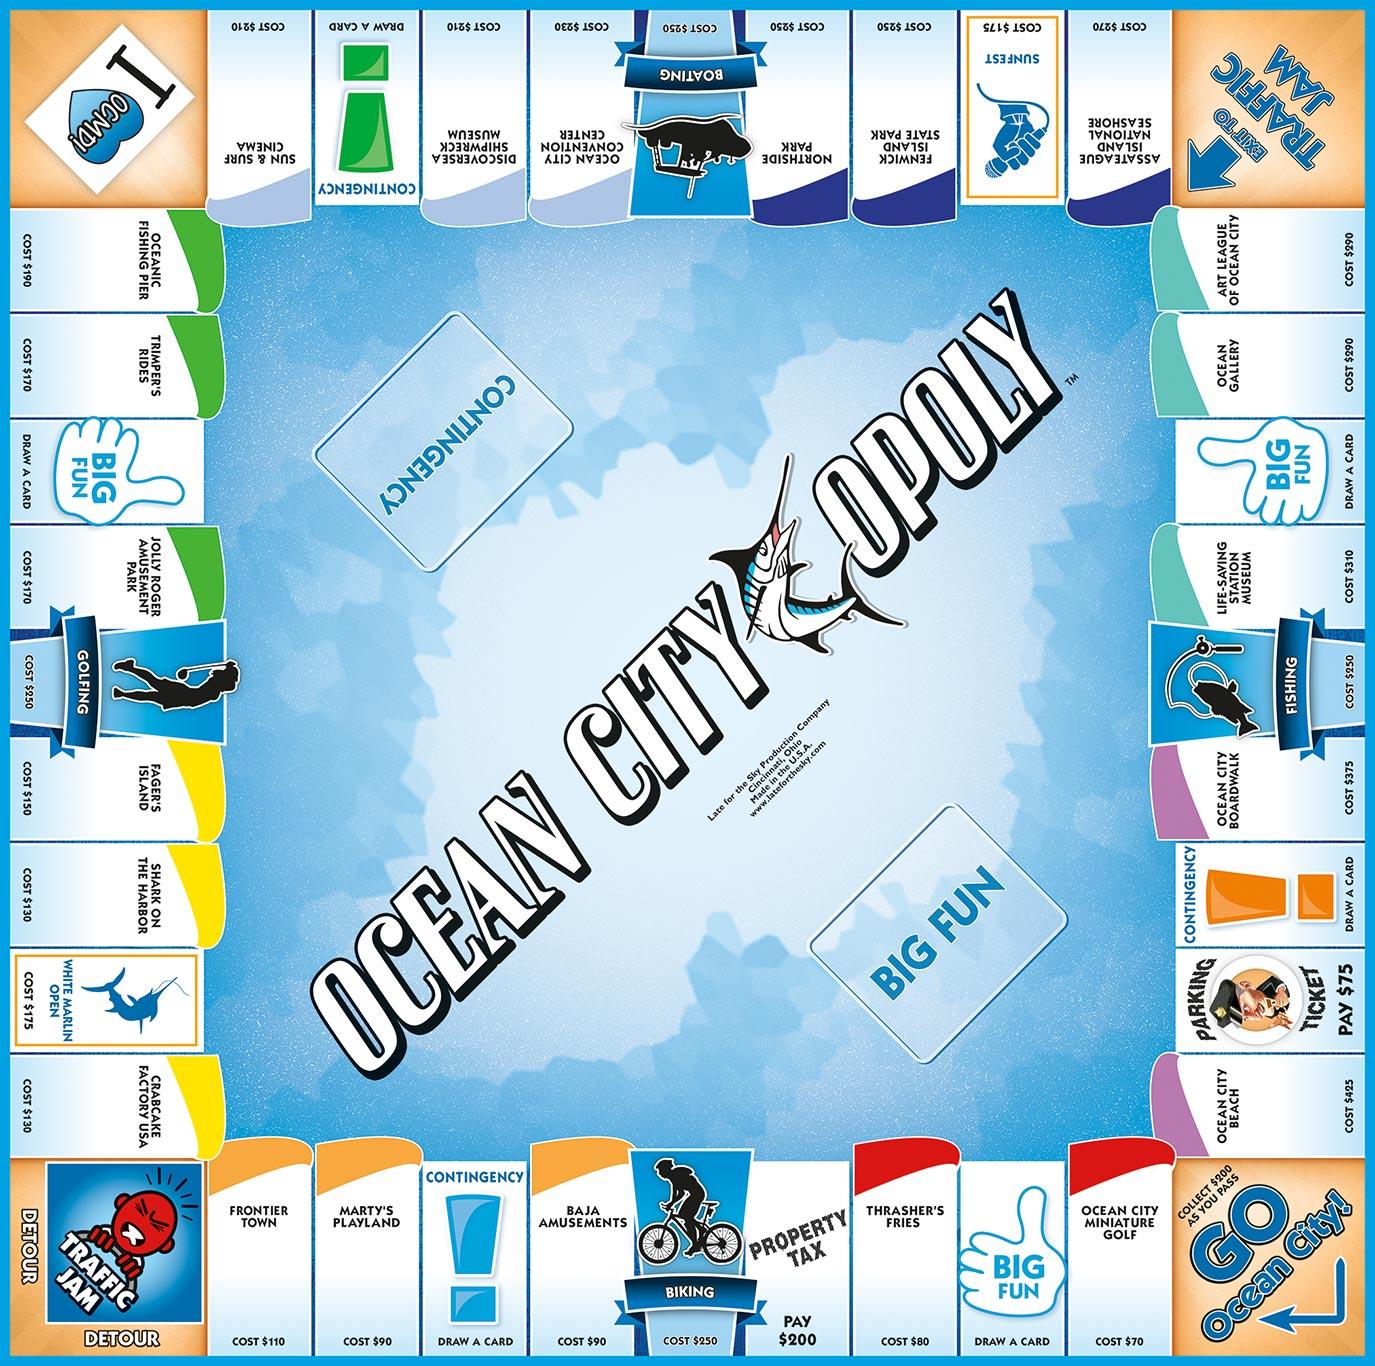 OCEAN CITY-OPOLY Board Game